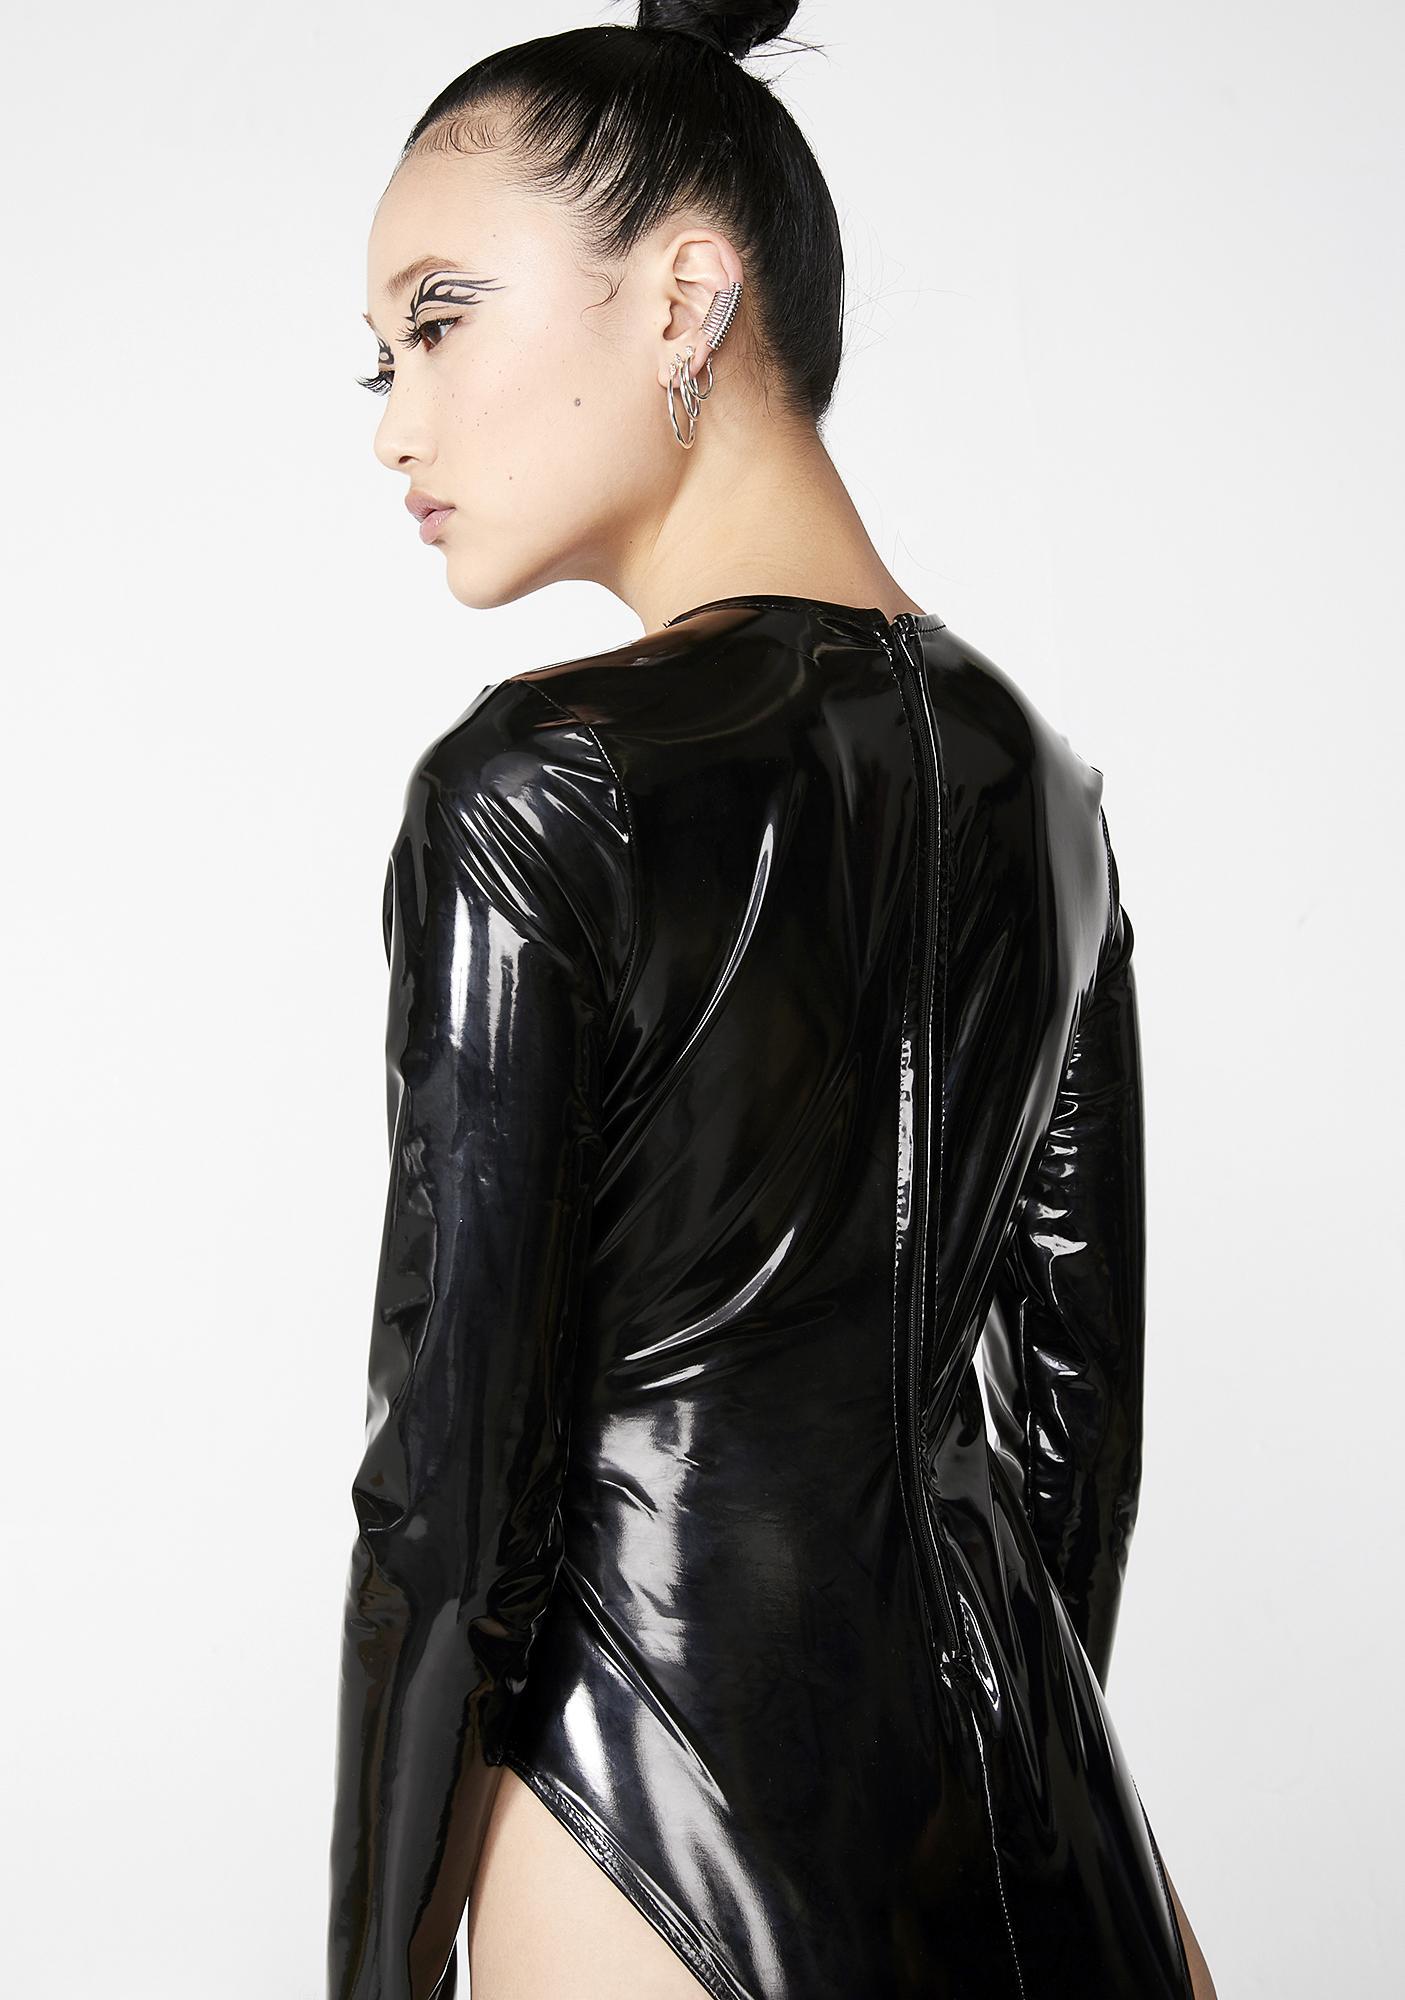 Warp Speed Vinyl Bodysuit